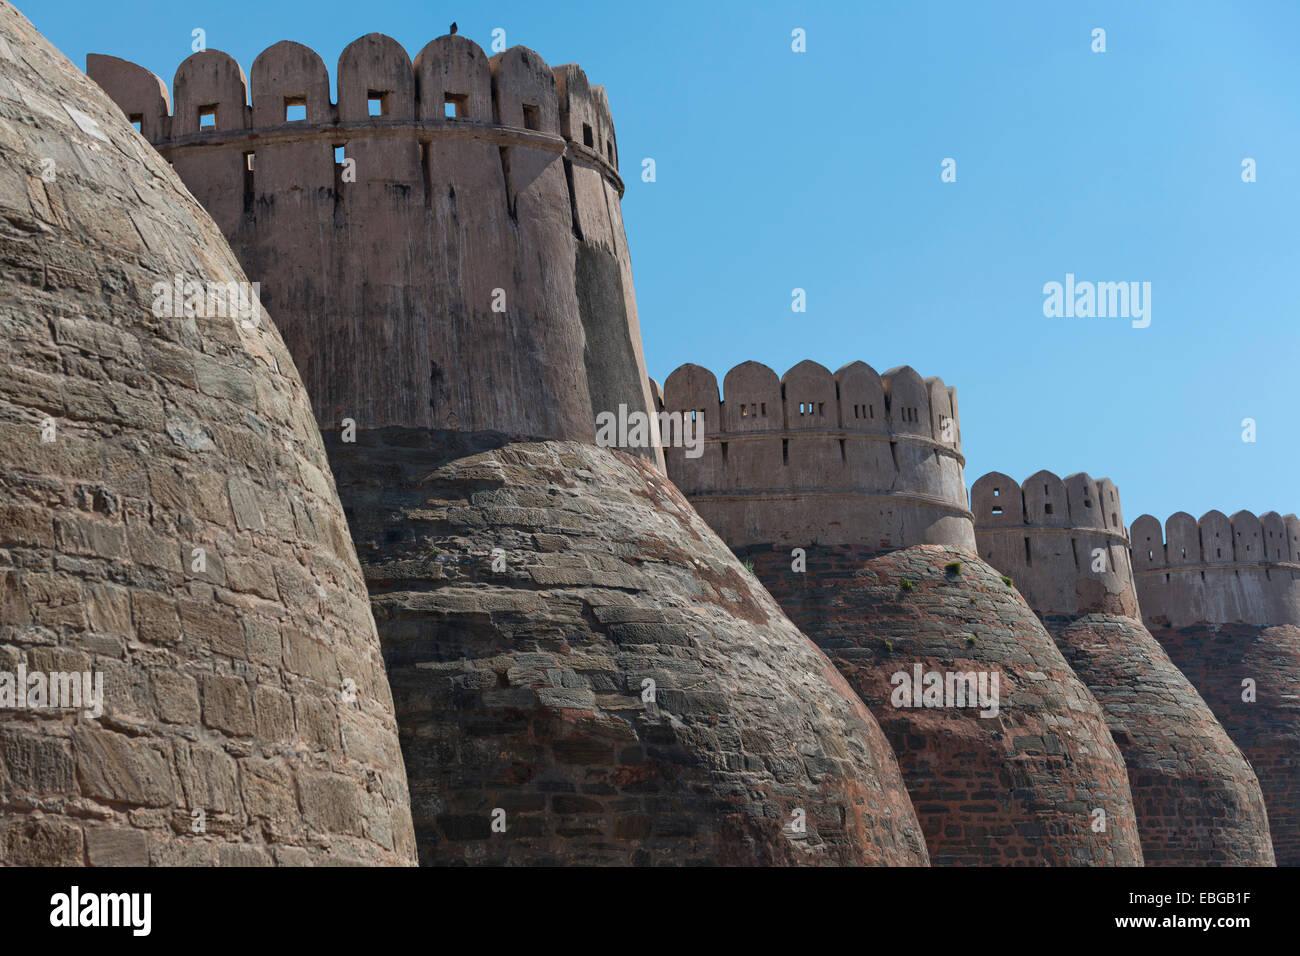 Fortified wall, Kumbhalgarh Fort or Kumbhalmer Fort, Kumbhalgarh, Rajasthan, India - Stock Image